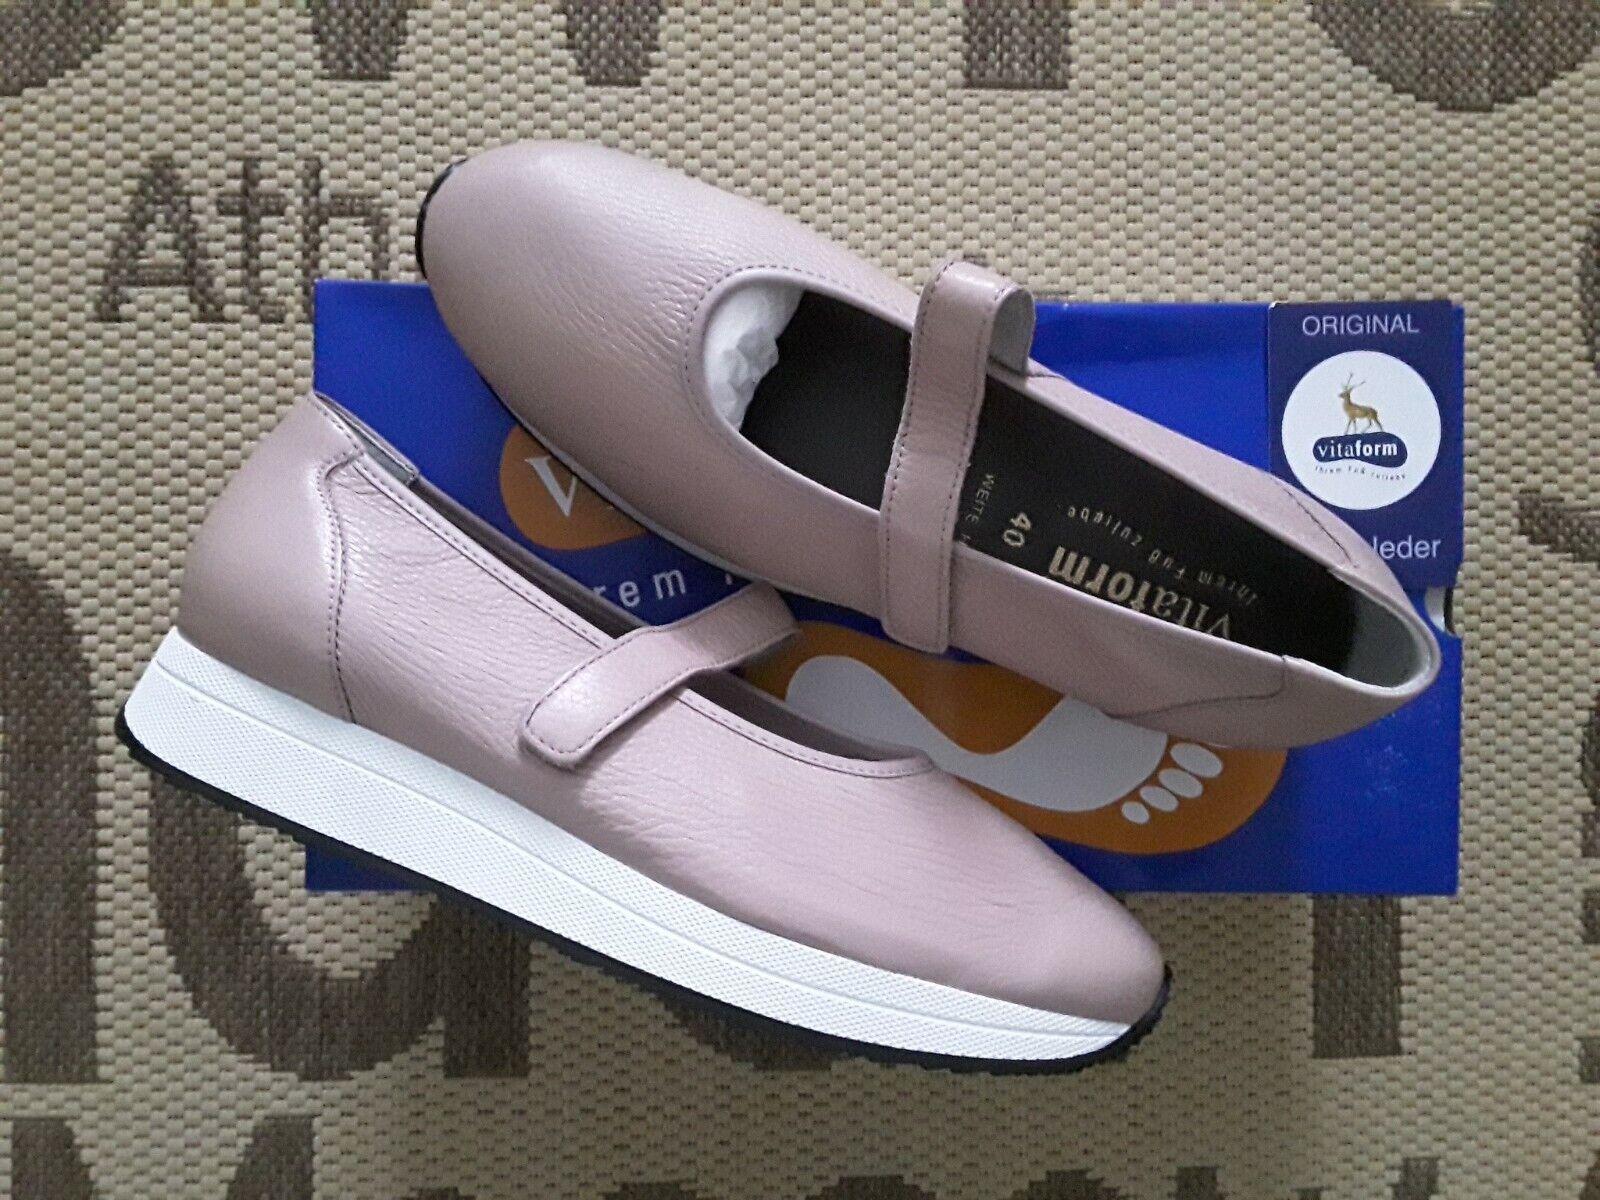 Schuhe, Leder Anti VITAFORM %%% NEU 40, Grosse Shock